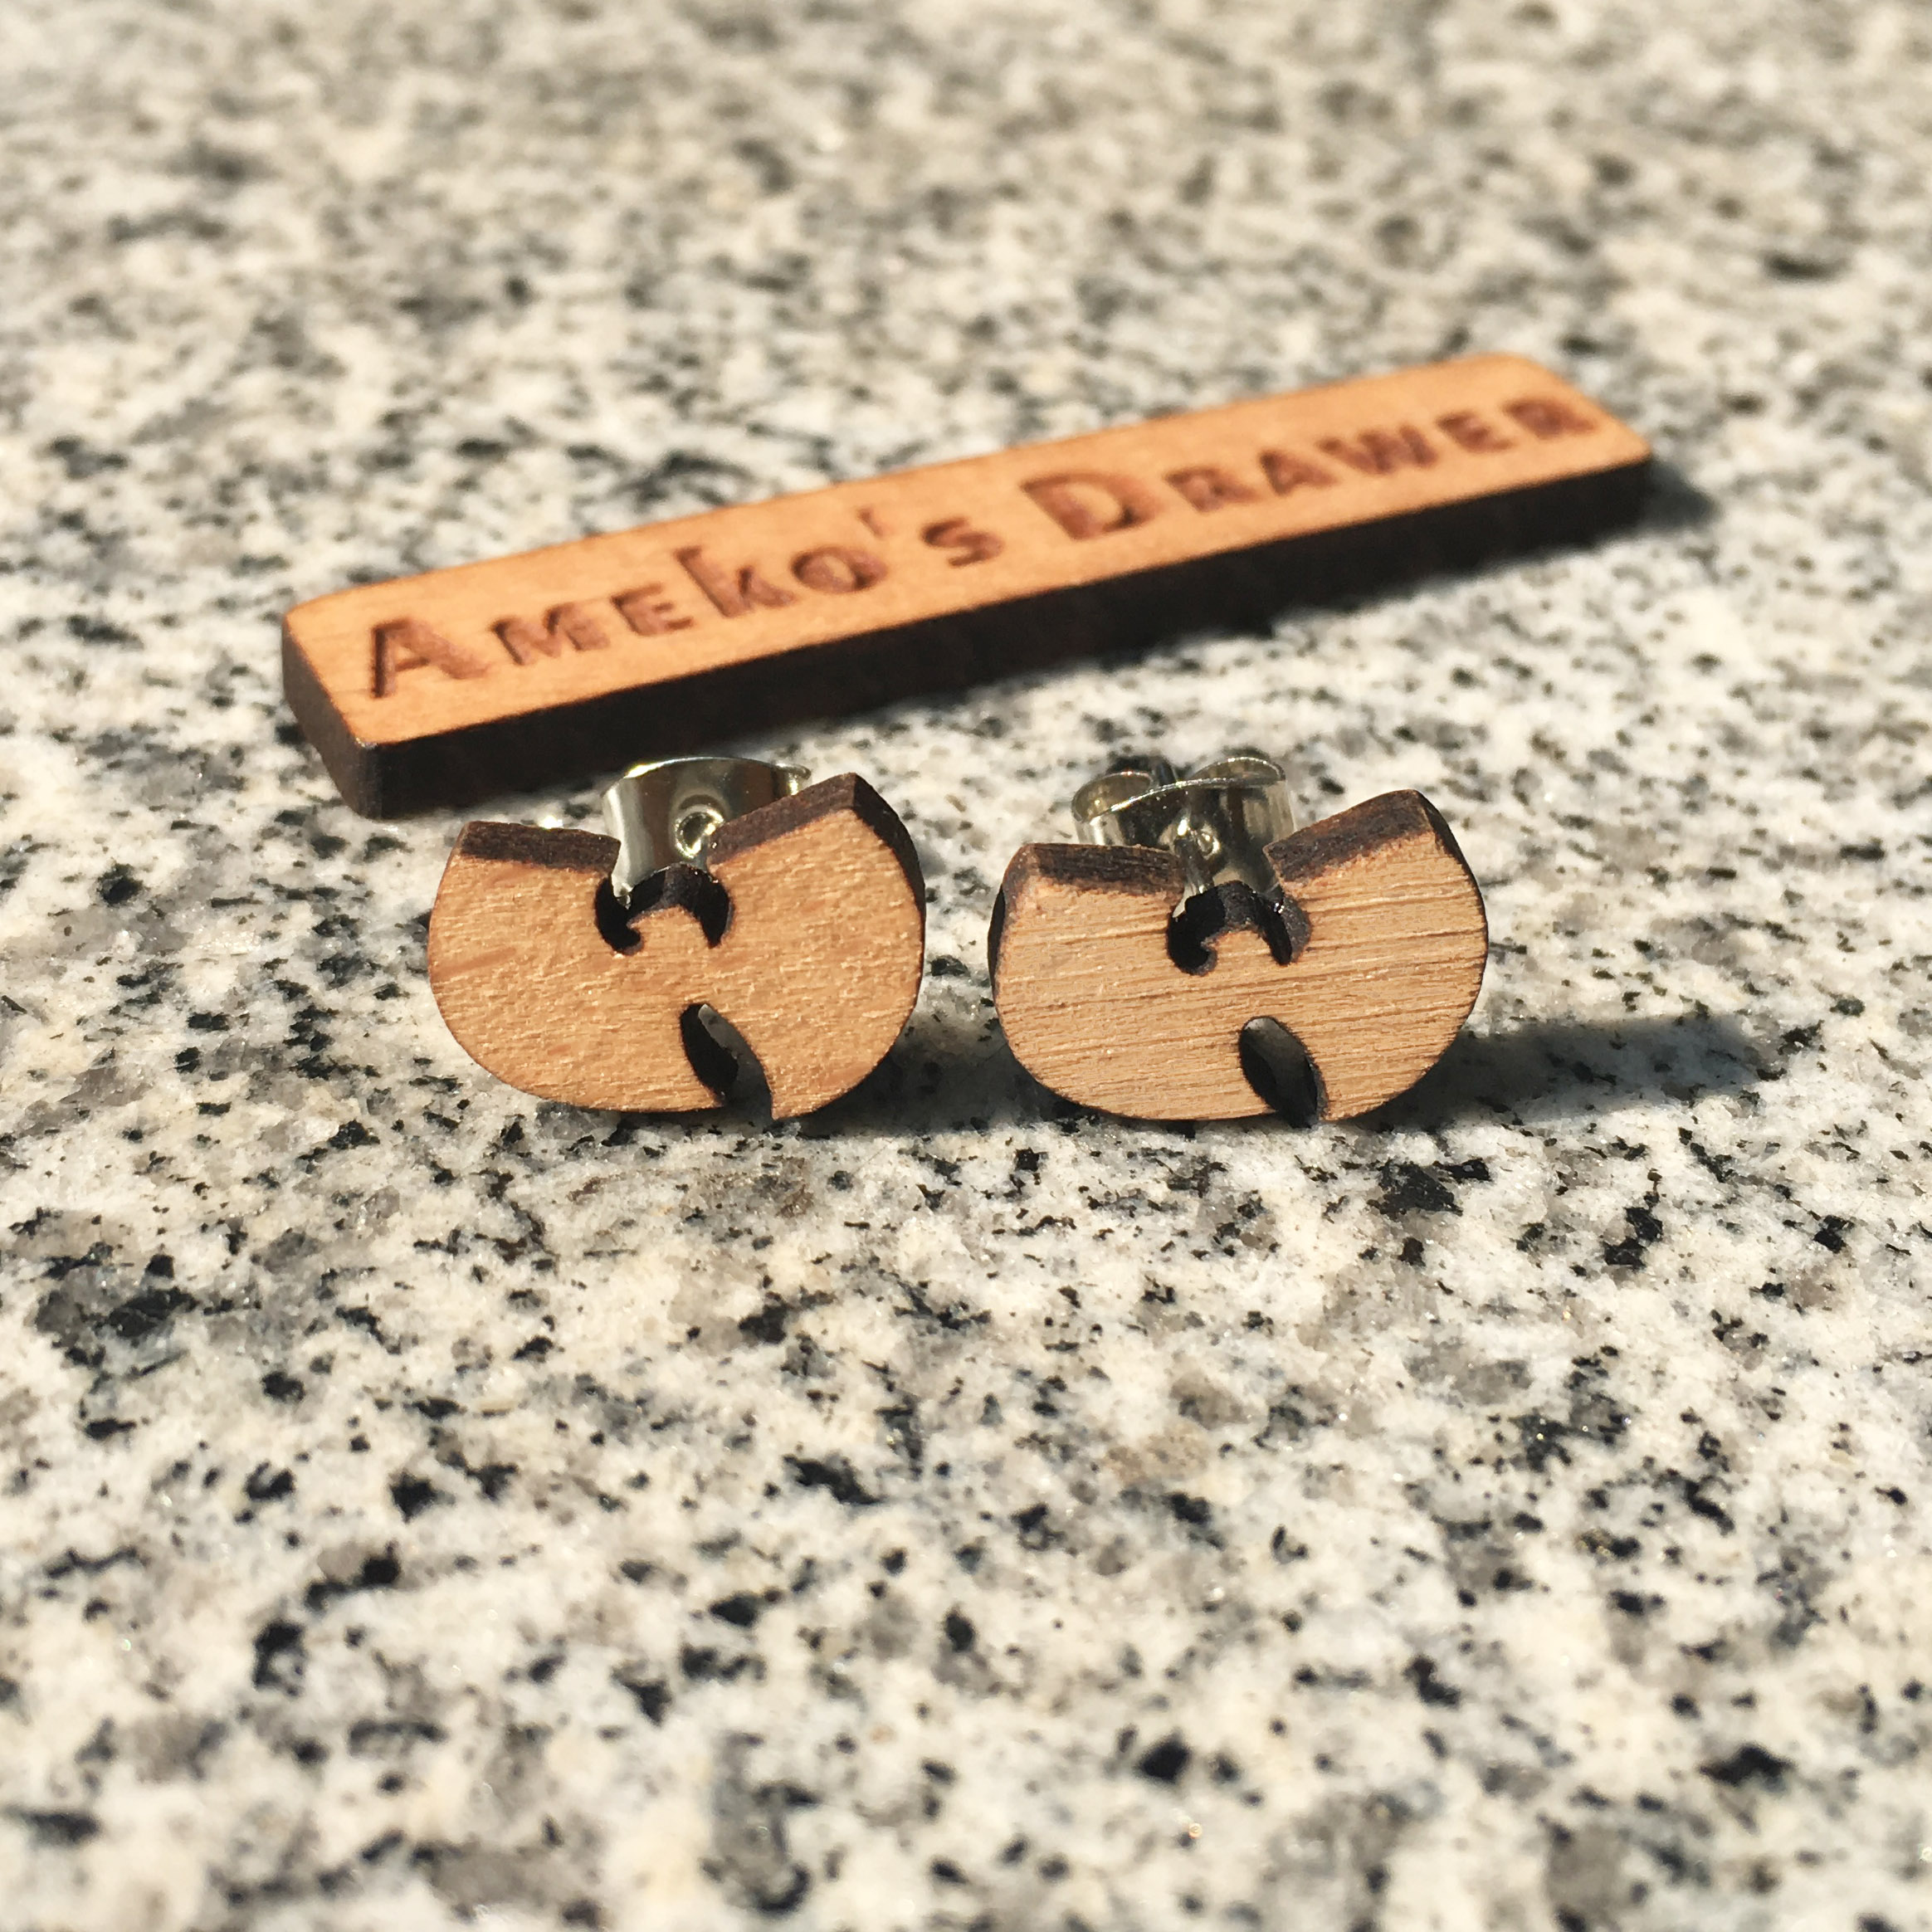 Wu-Tang Clan Earring Laser Engraved Hip Hop Earrings Music Stud Super Star Wooden Earring Handmade Earring X 1 Pair